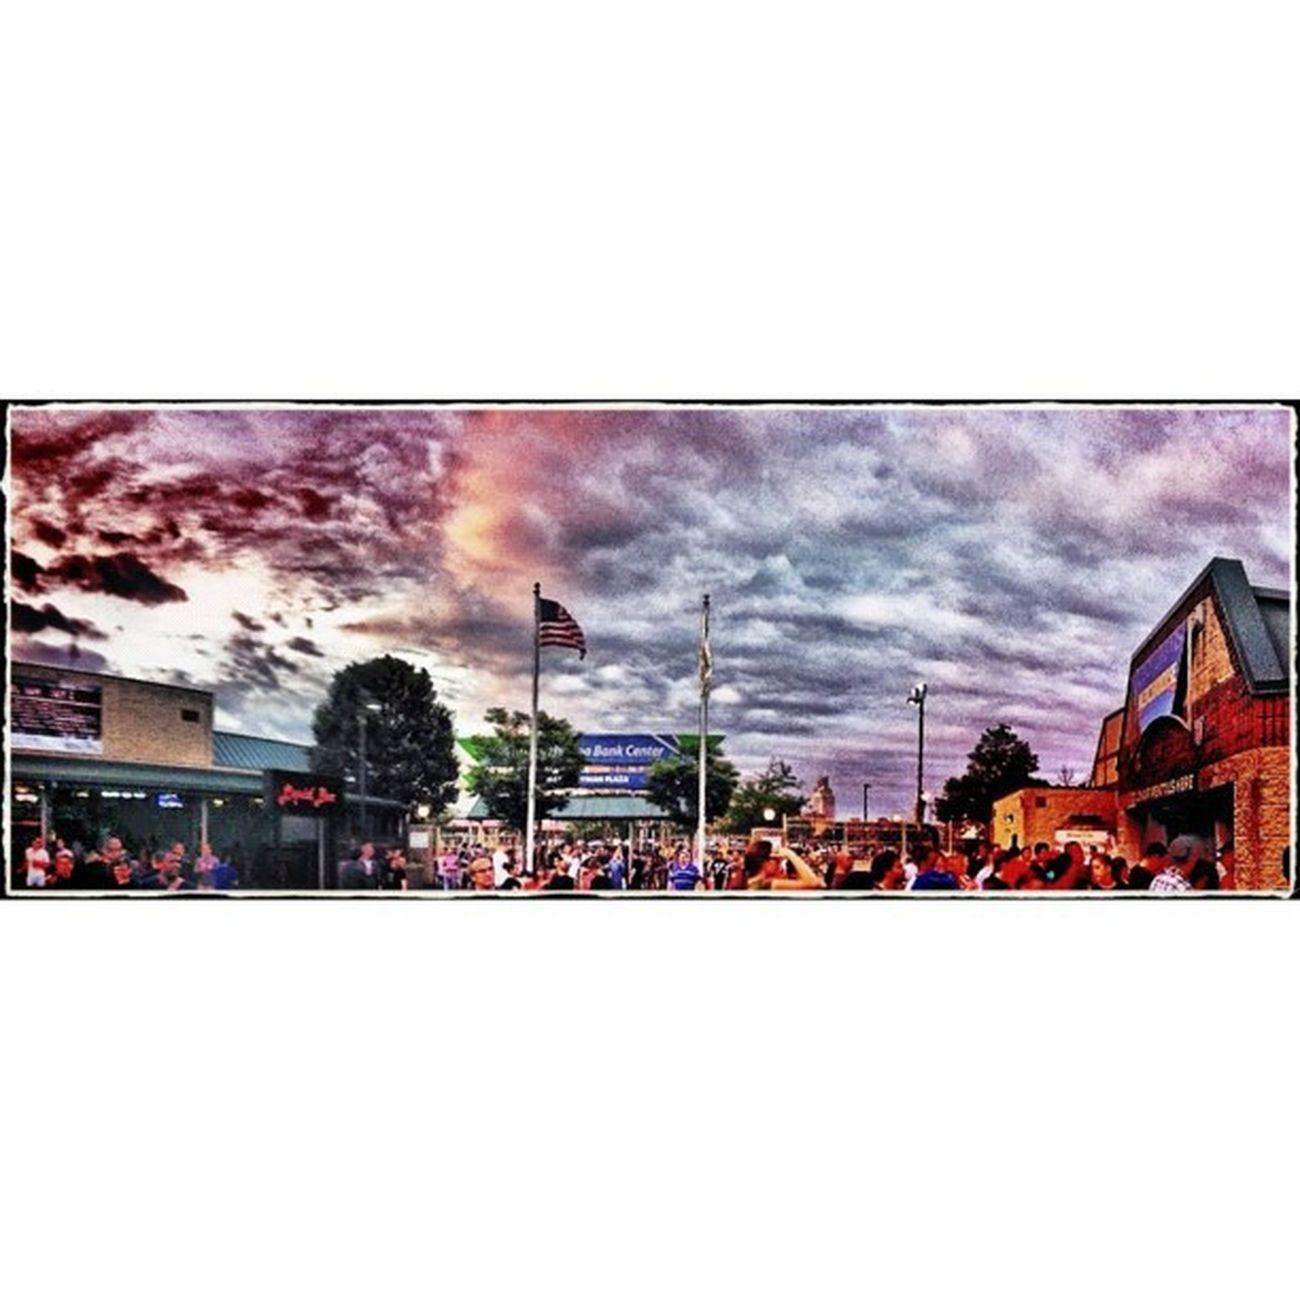 #radioheadcamden #radiohead #camden #clouds #sky #cloud #blueskys #sunshine #cloudporn #skyporn #skysnappers #clouds #sky #cloud #blueskys #sunshine #cloudporn #skyporn #skysnappers Clouds Sunshine Sky Cloud Cloudporn Radiohead Skyporn Skysnappers Camden Blueskys Radioheadcamden